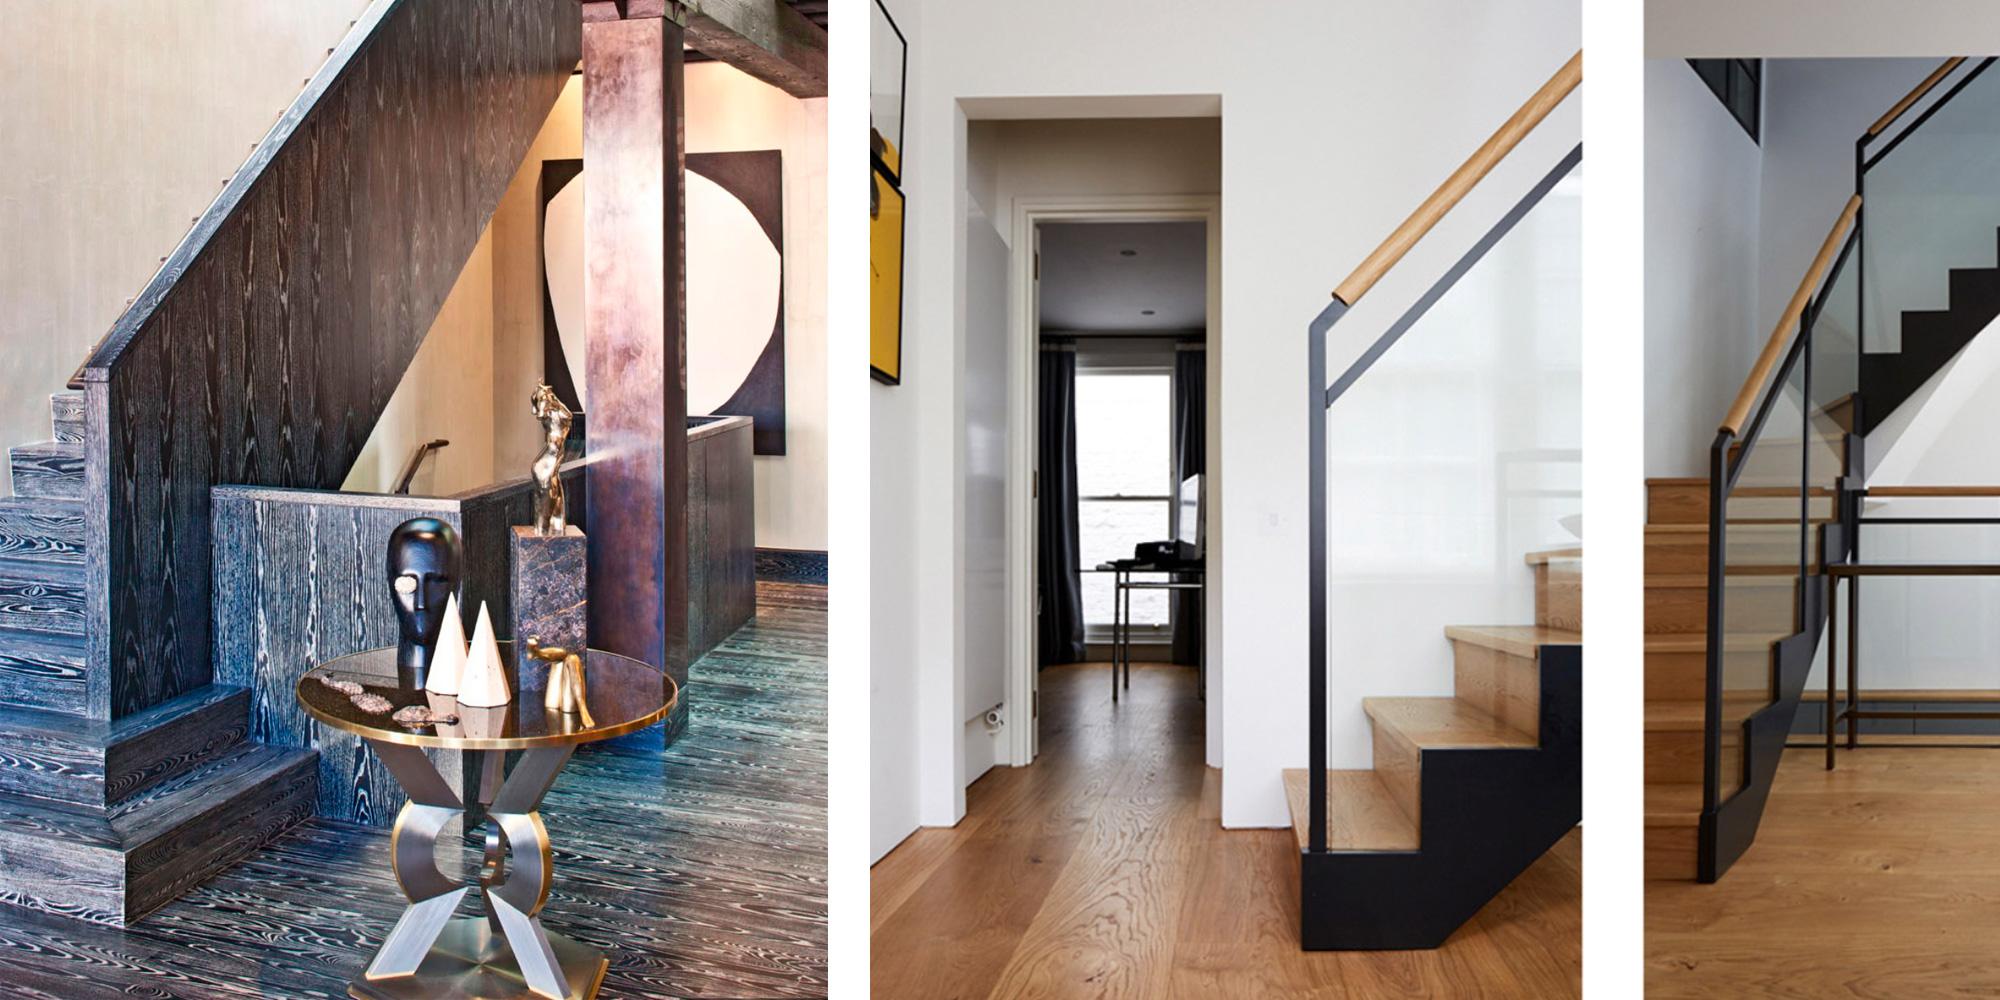 Nikkirees.com-wimbledon-Kellywearstler-WaldoWorks-entrance-hall-interiors